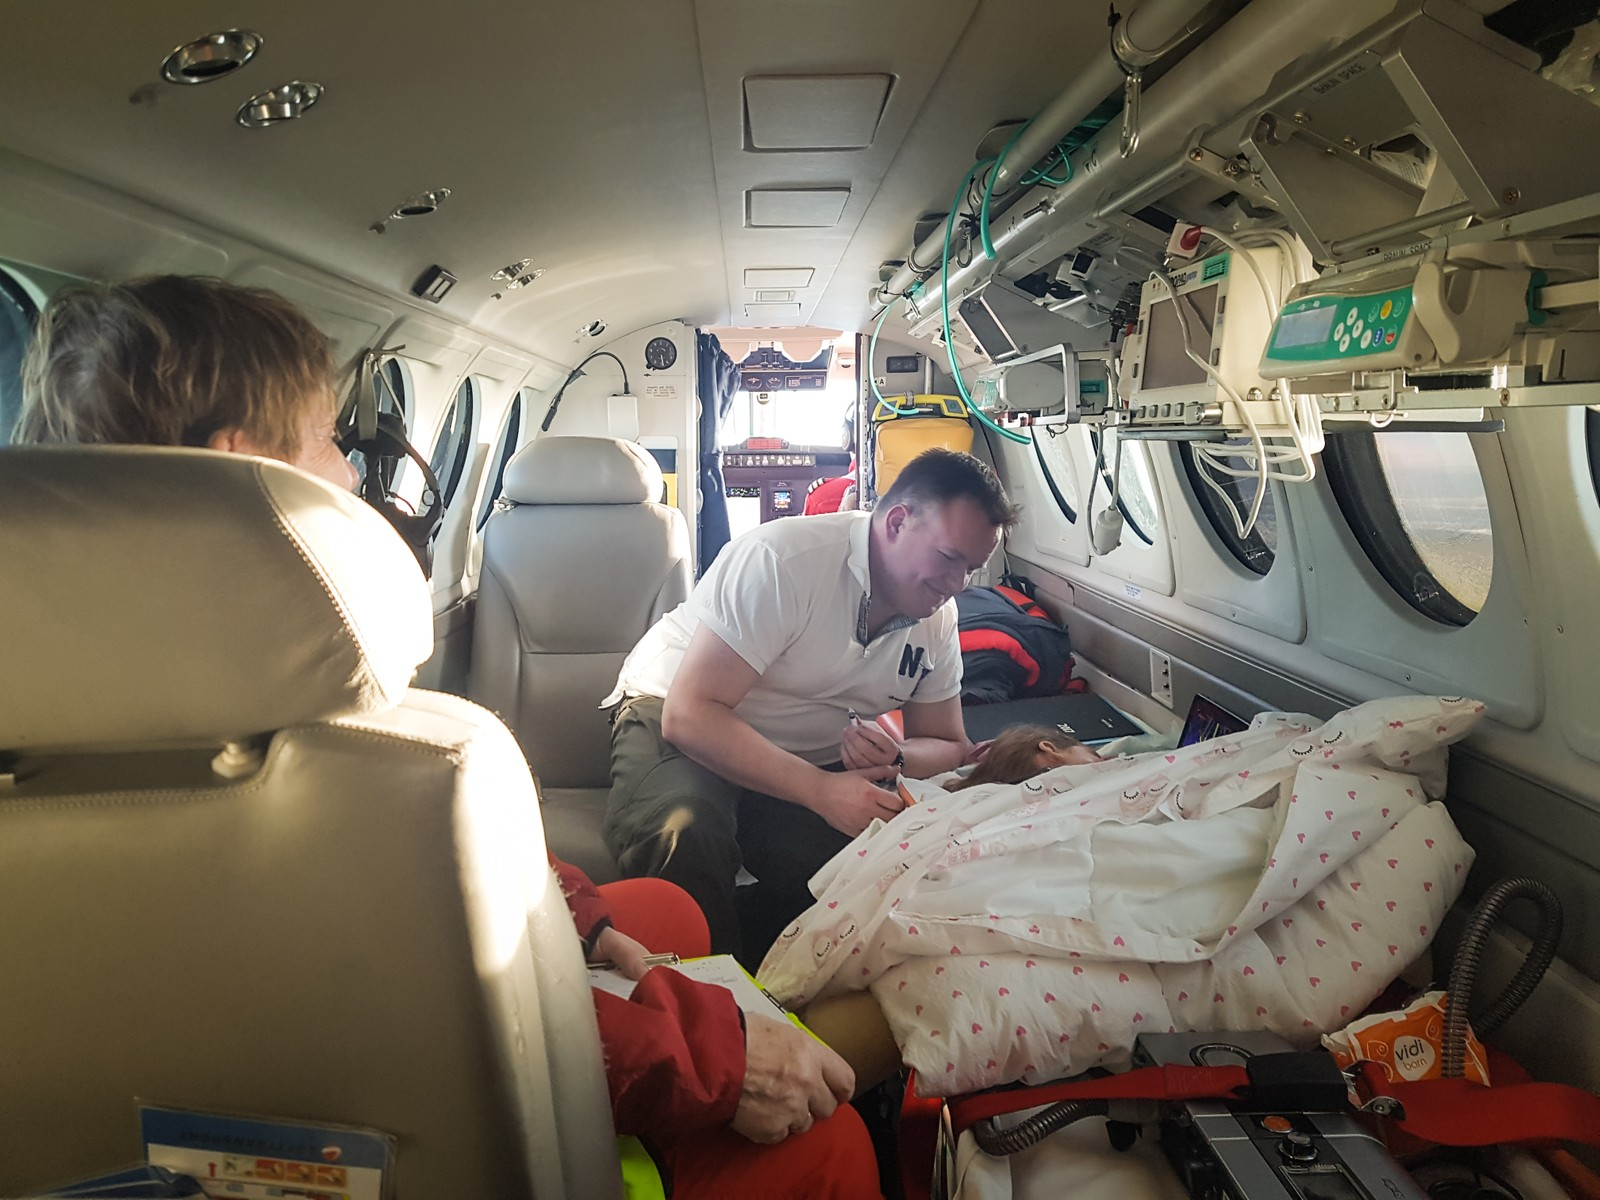 Frida Marie og pappa Morten om bord på ambulansefly